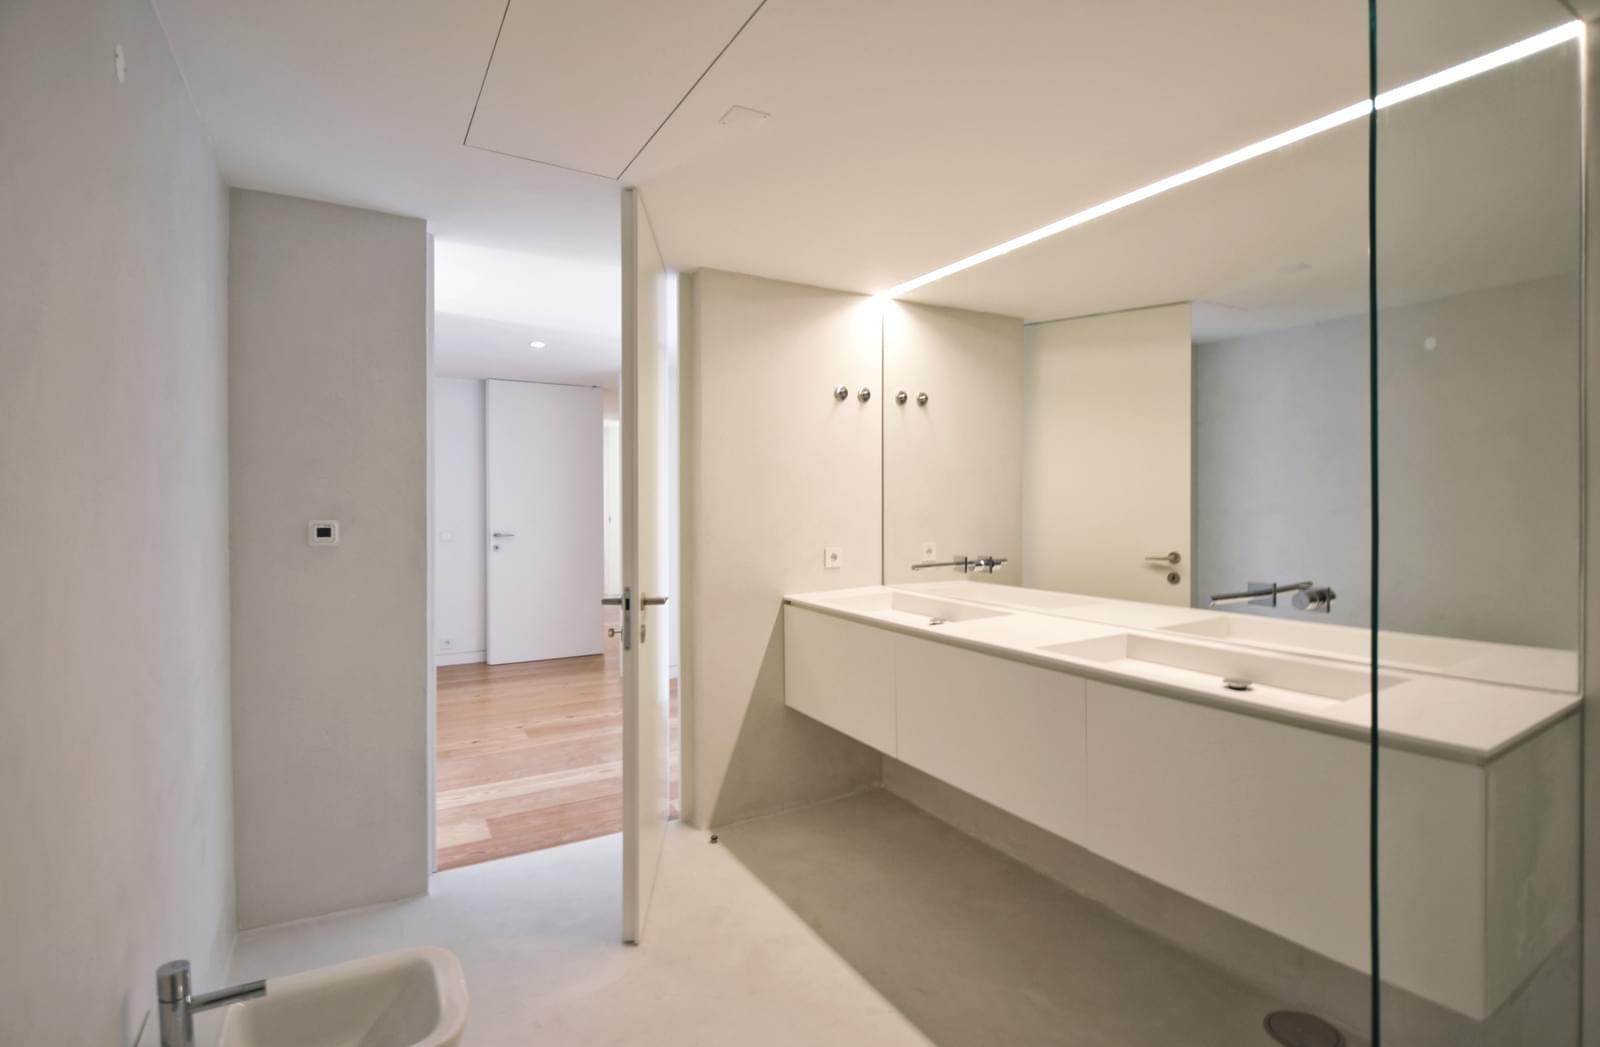 pf18051-apartamento-t4-lisboa-82c4e994-9e8b-4a59-928b-c7e2980ebe61